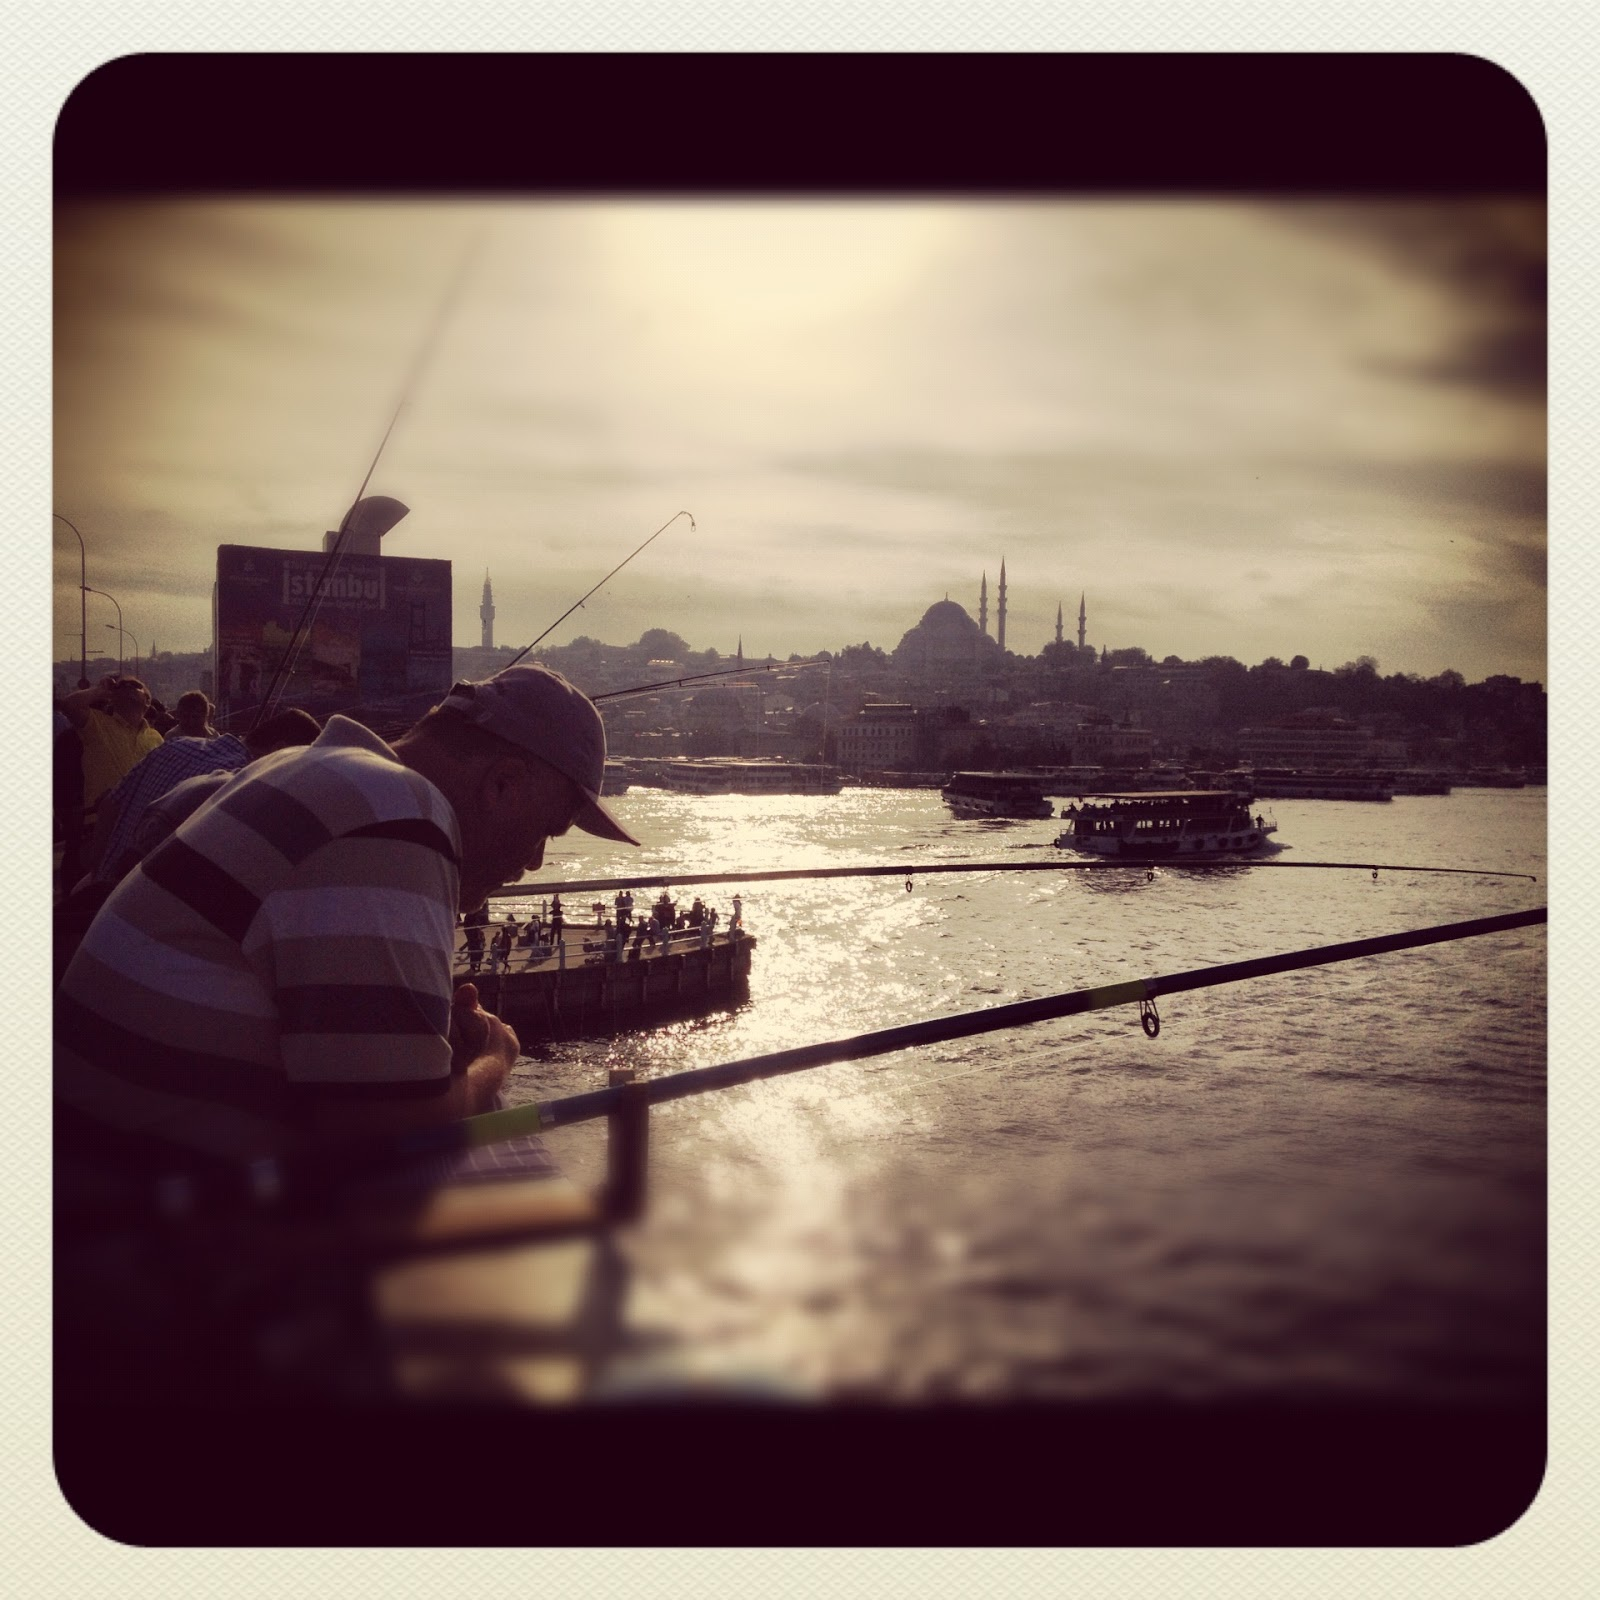 Locals Fishing from the Galata Bridge